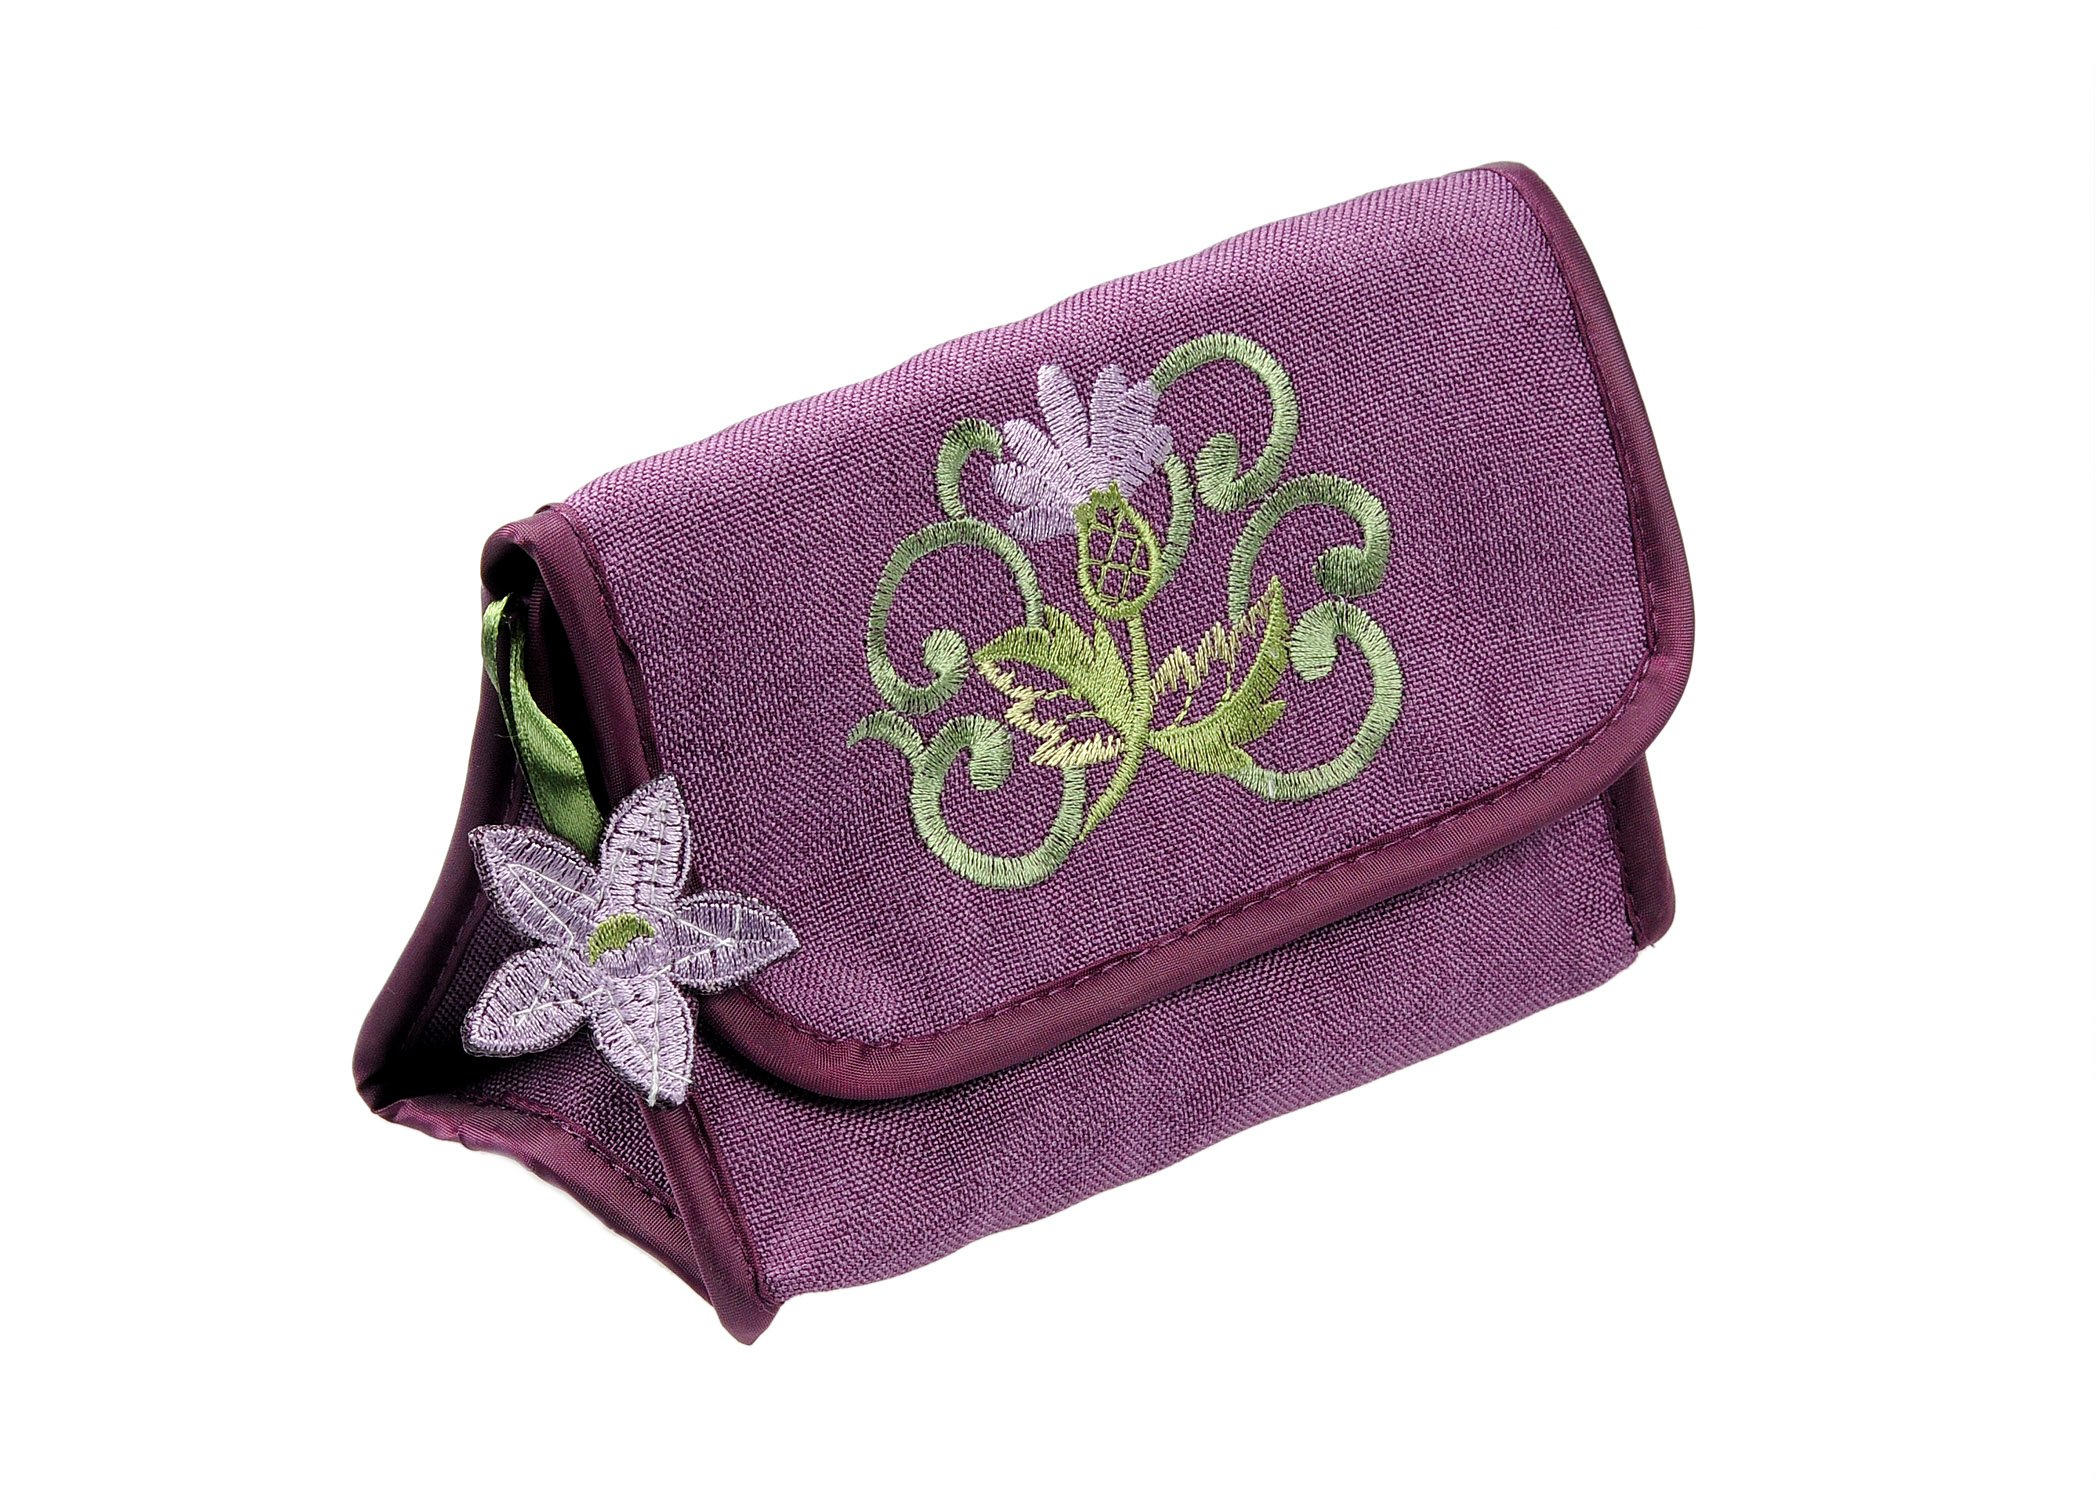 Cosmetic Bag in a Glencoe Thistle Design.